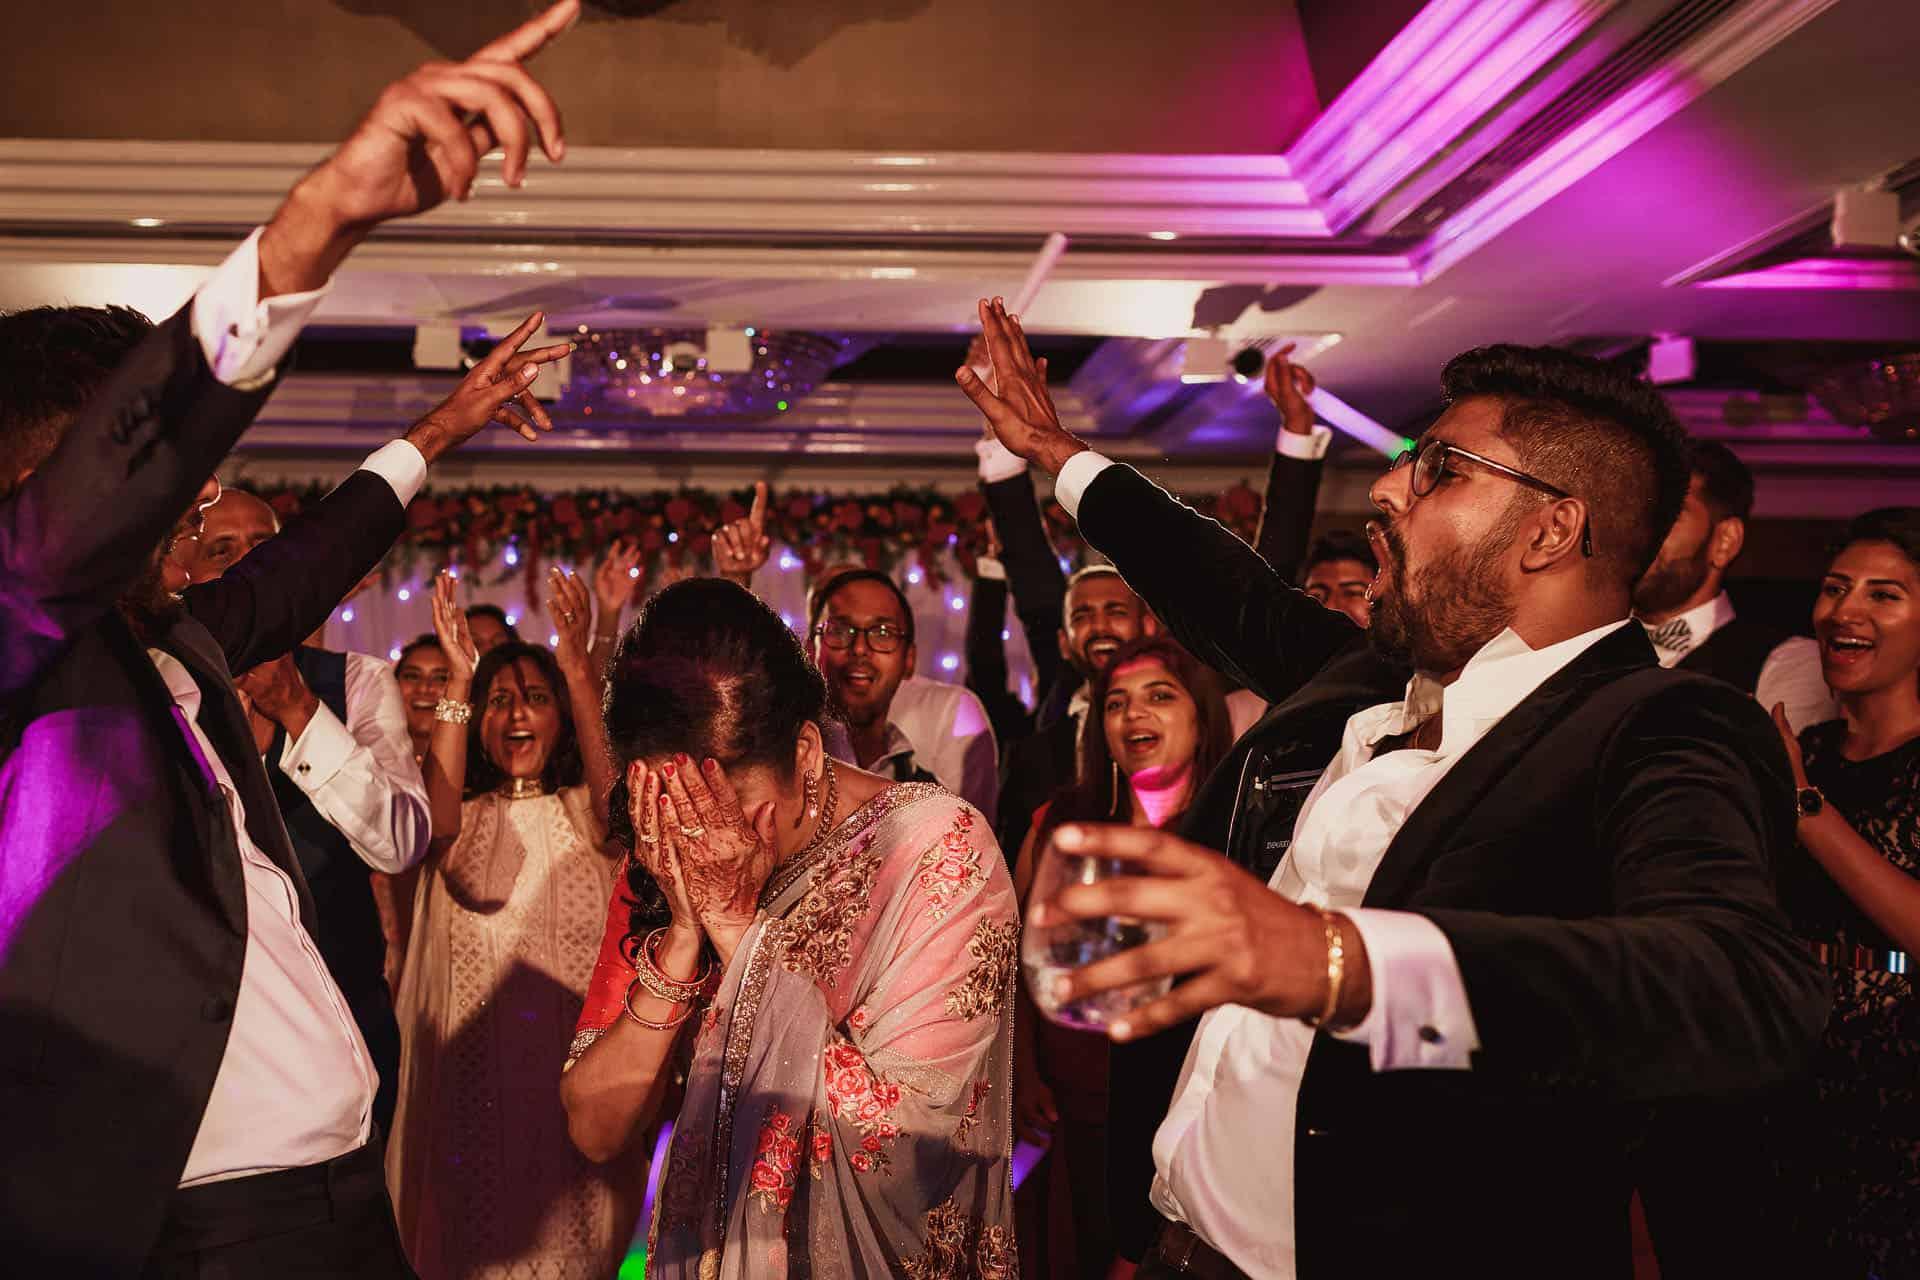 jumeirah carlton tower hindu wedding reception